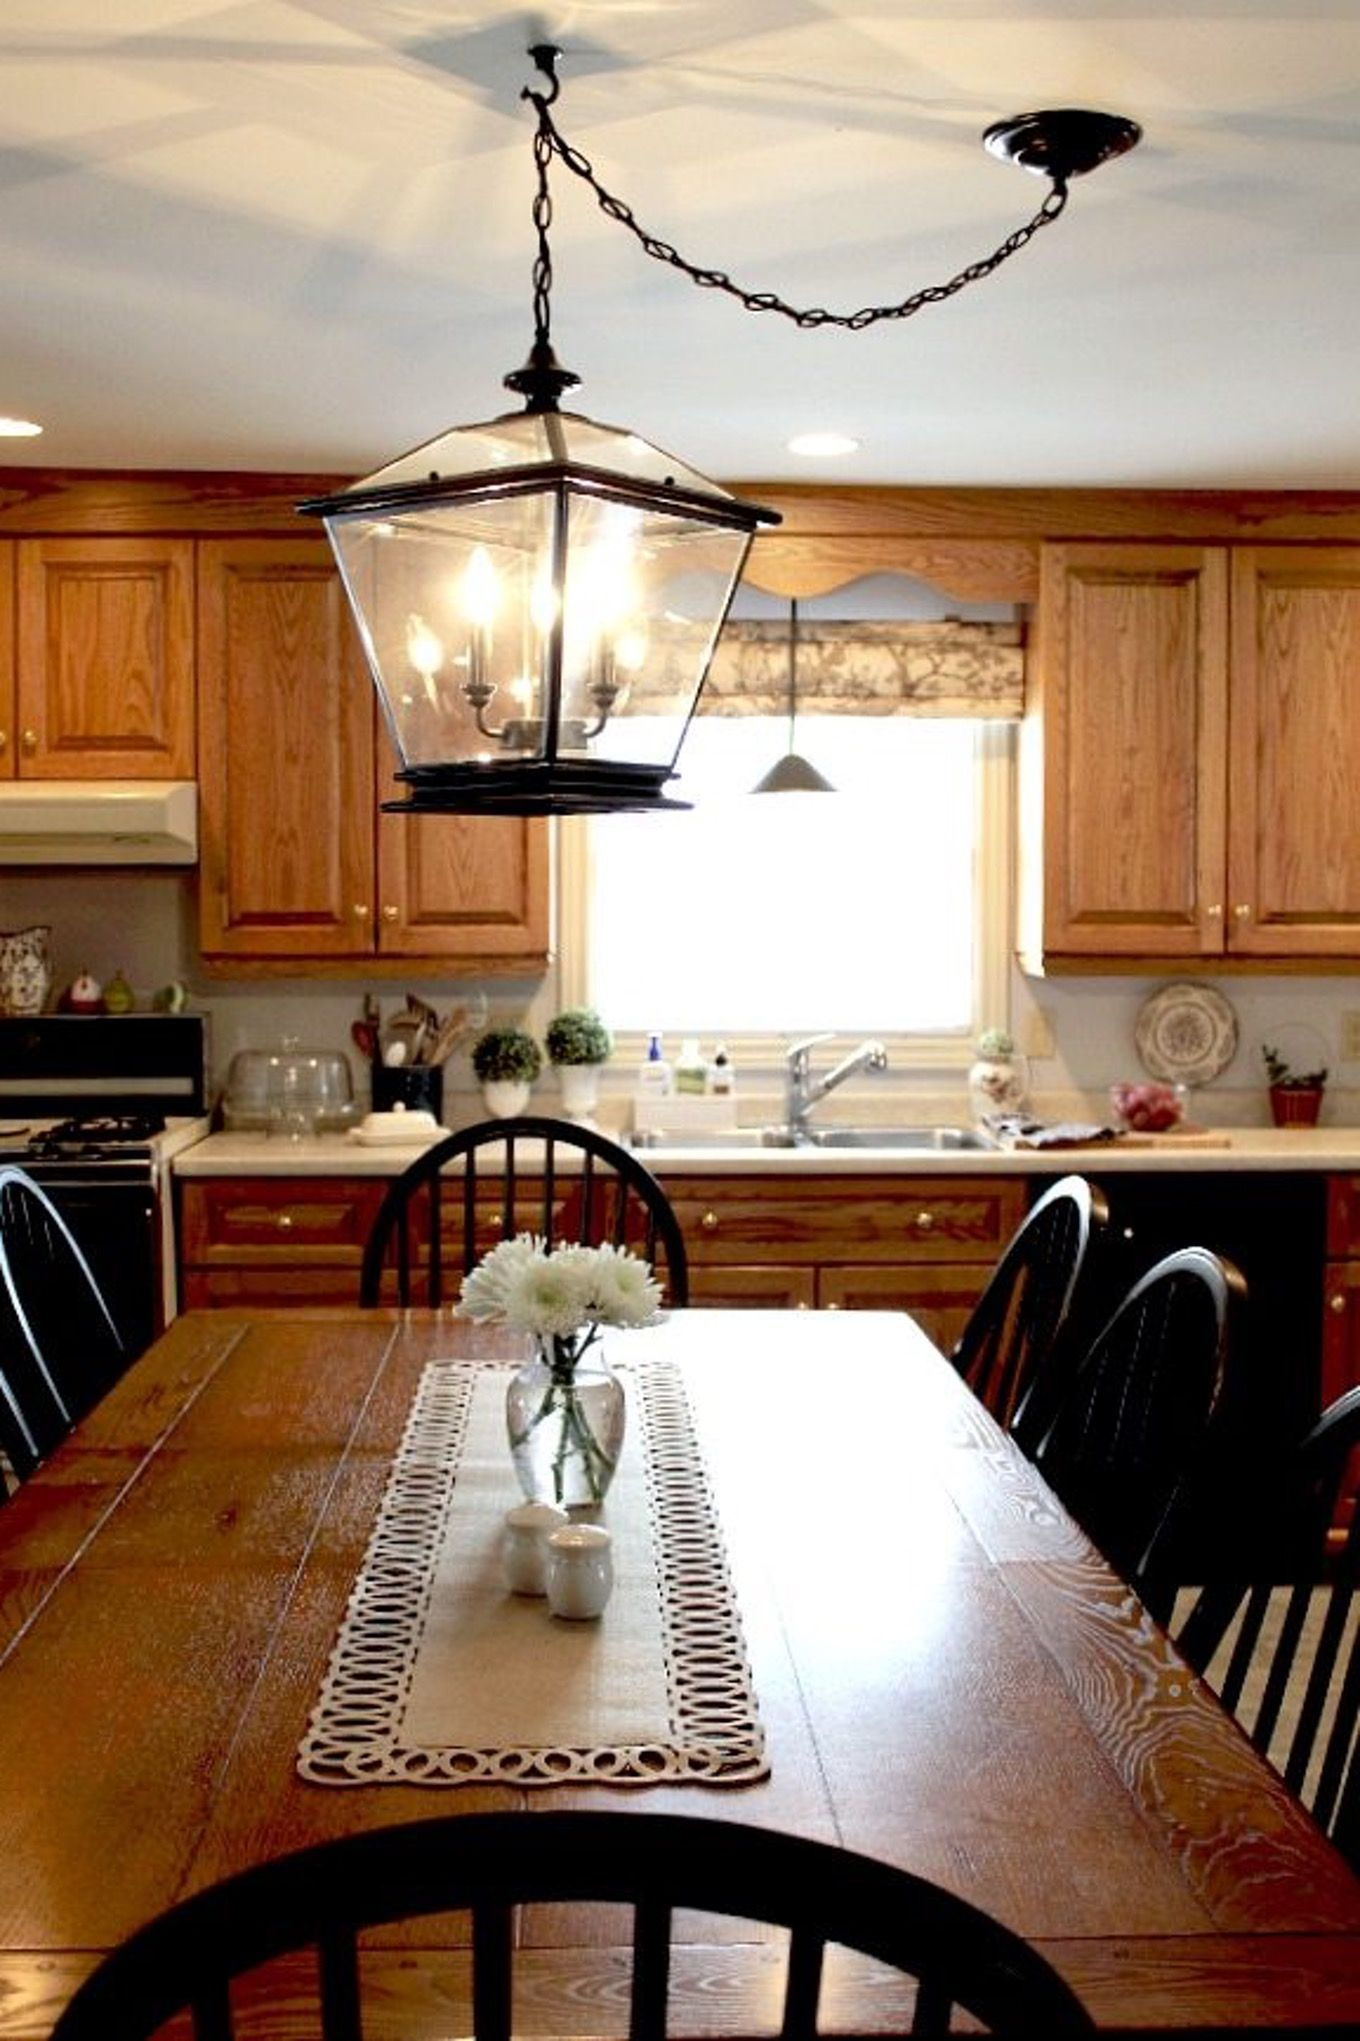 diy kitchen lighting. 20 Distinctive Kitchen Lighting Ideas For Your Wonderful Diy O